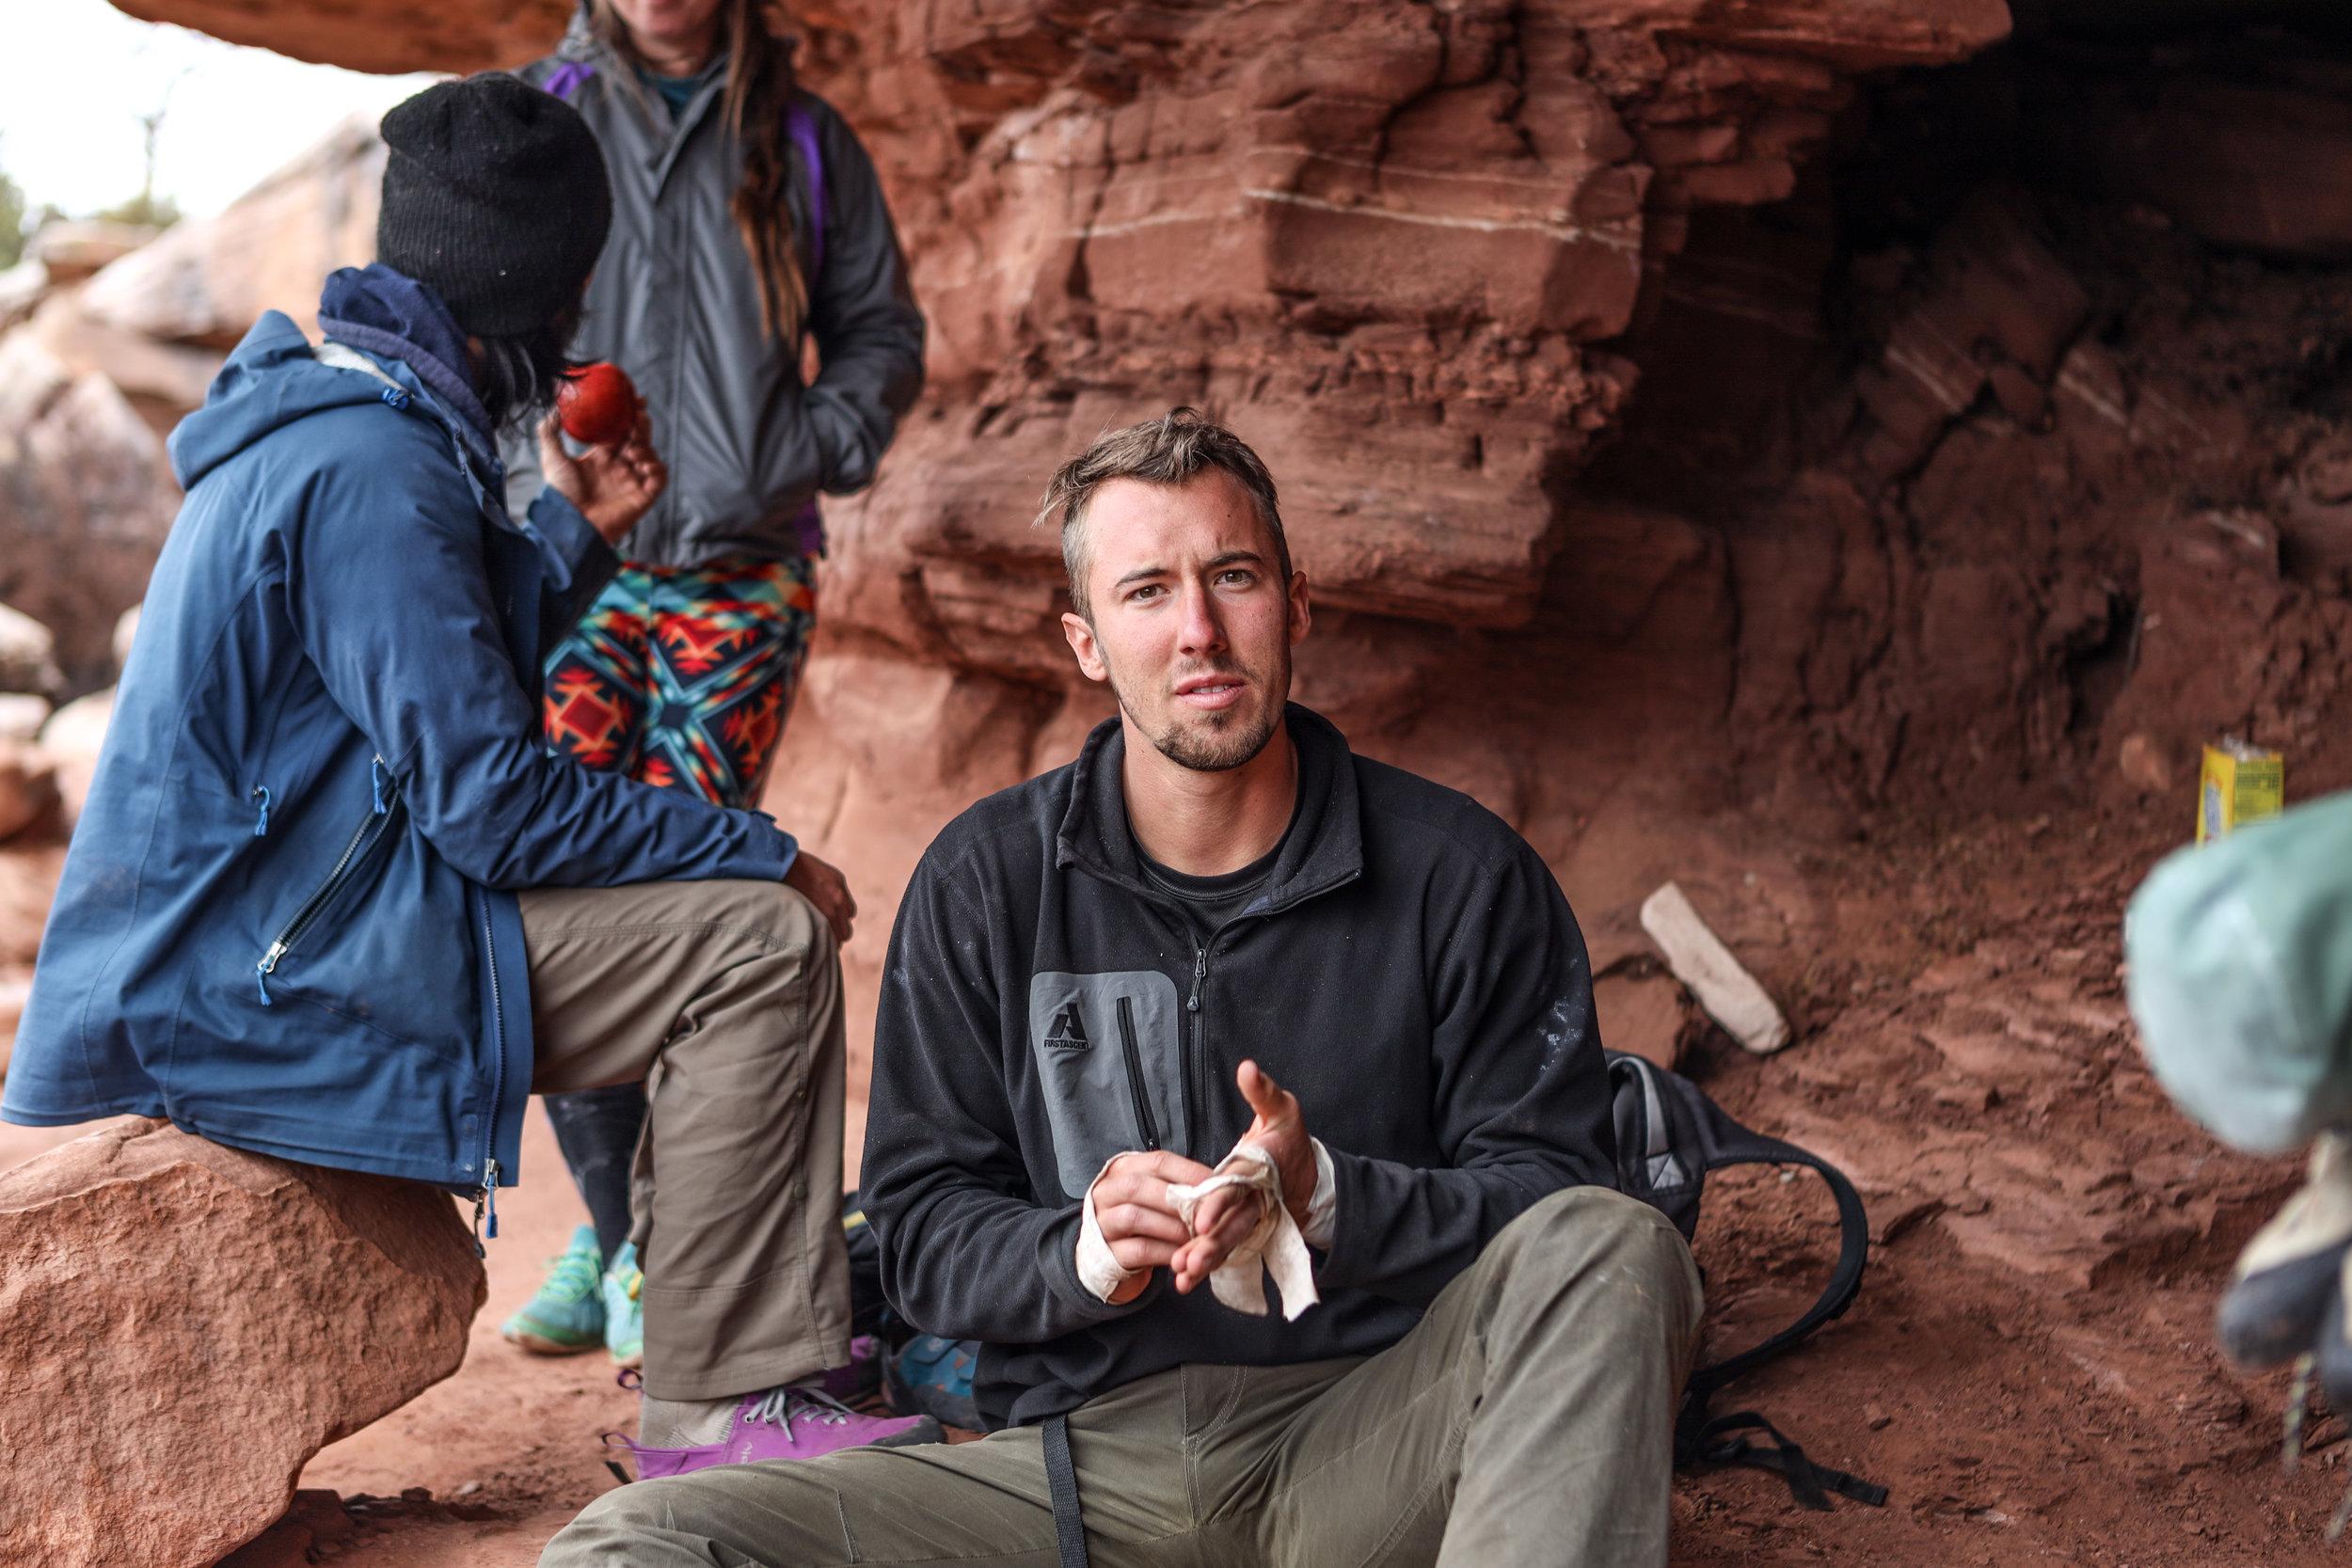 03.14.19 Moab Taos Trip-52.jpg